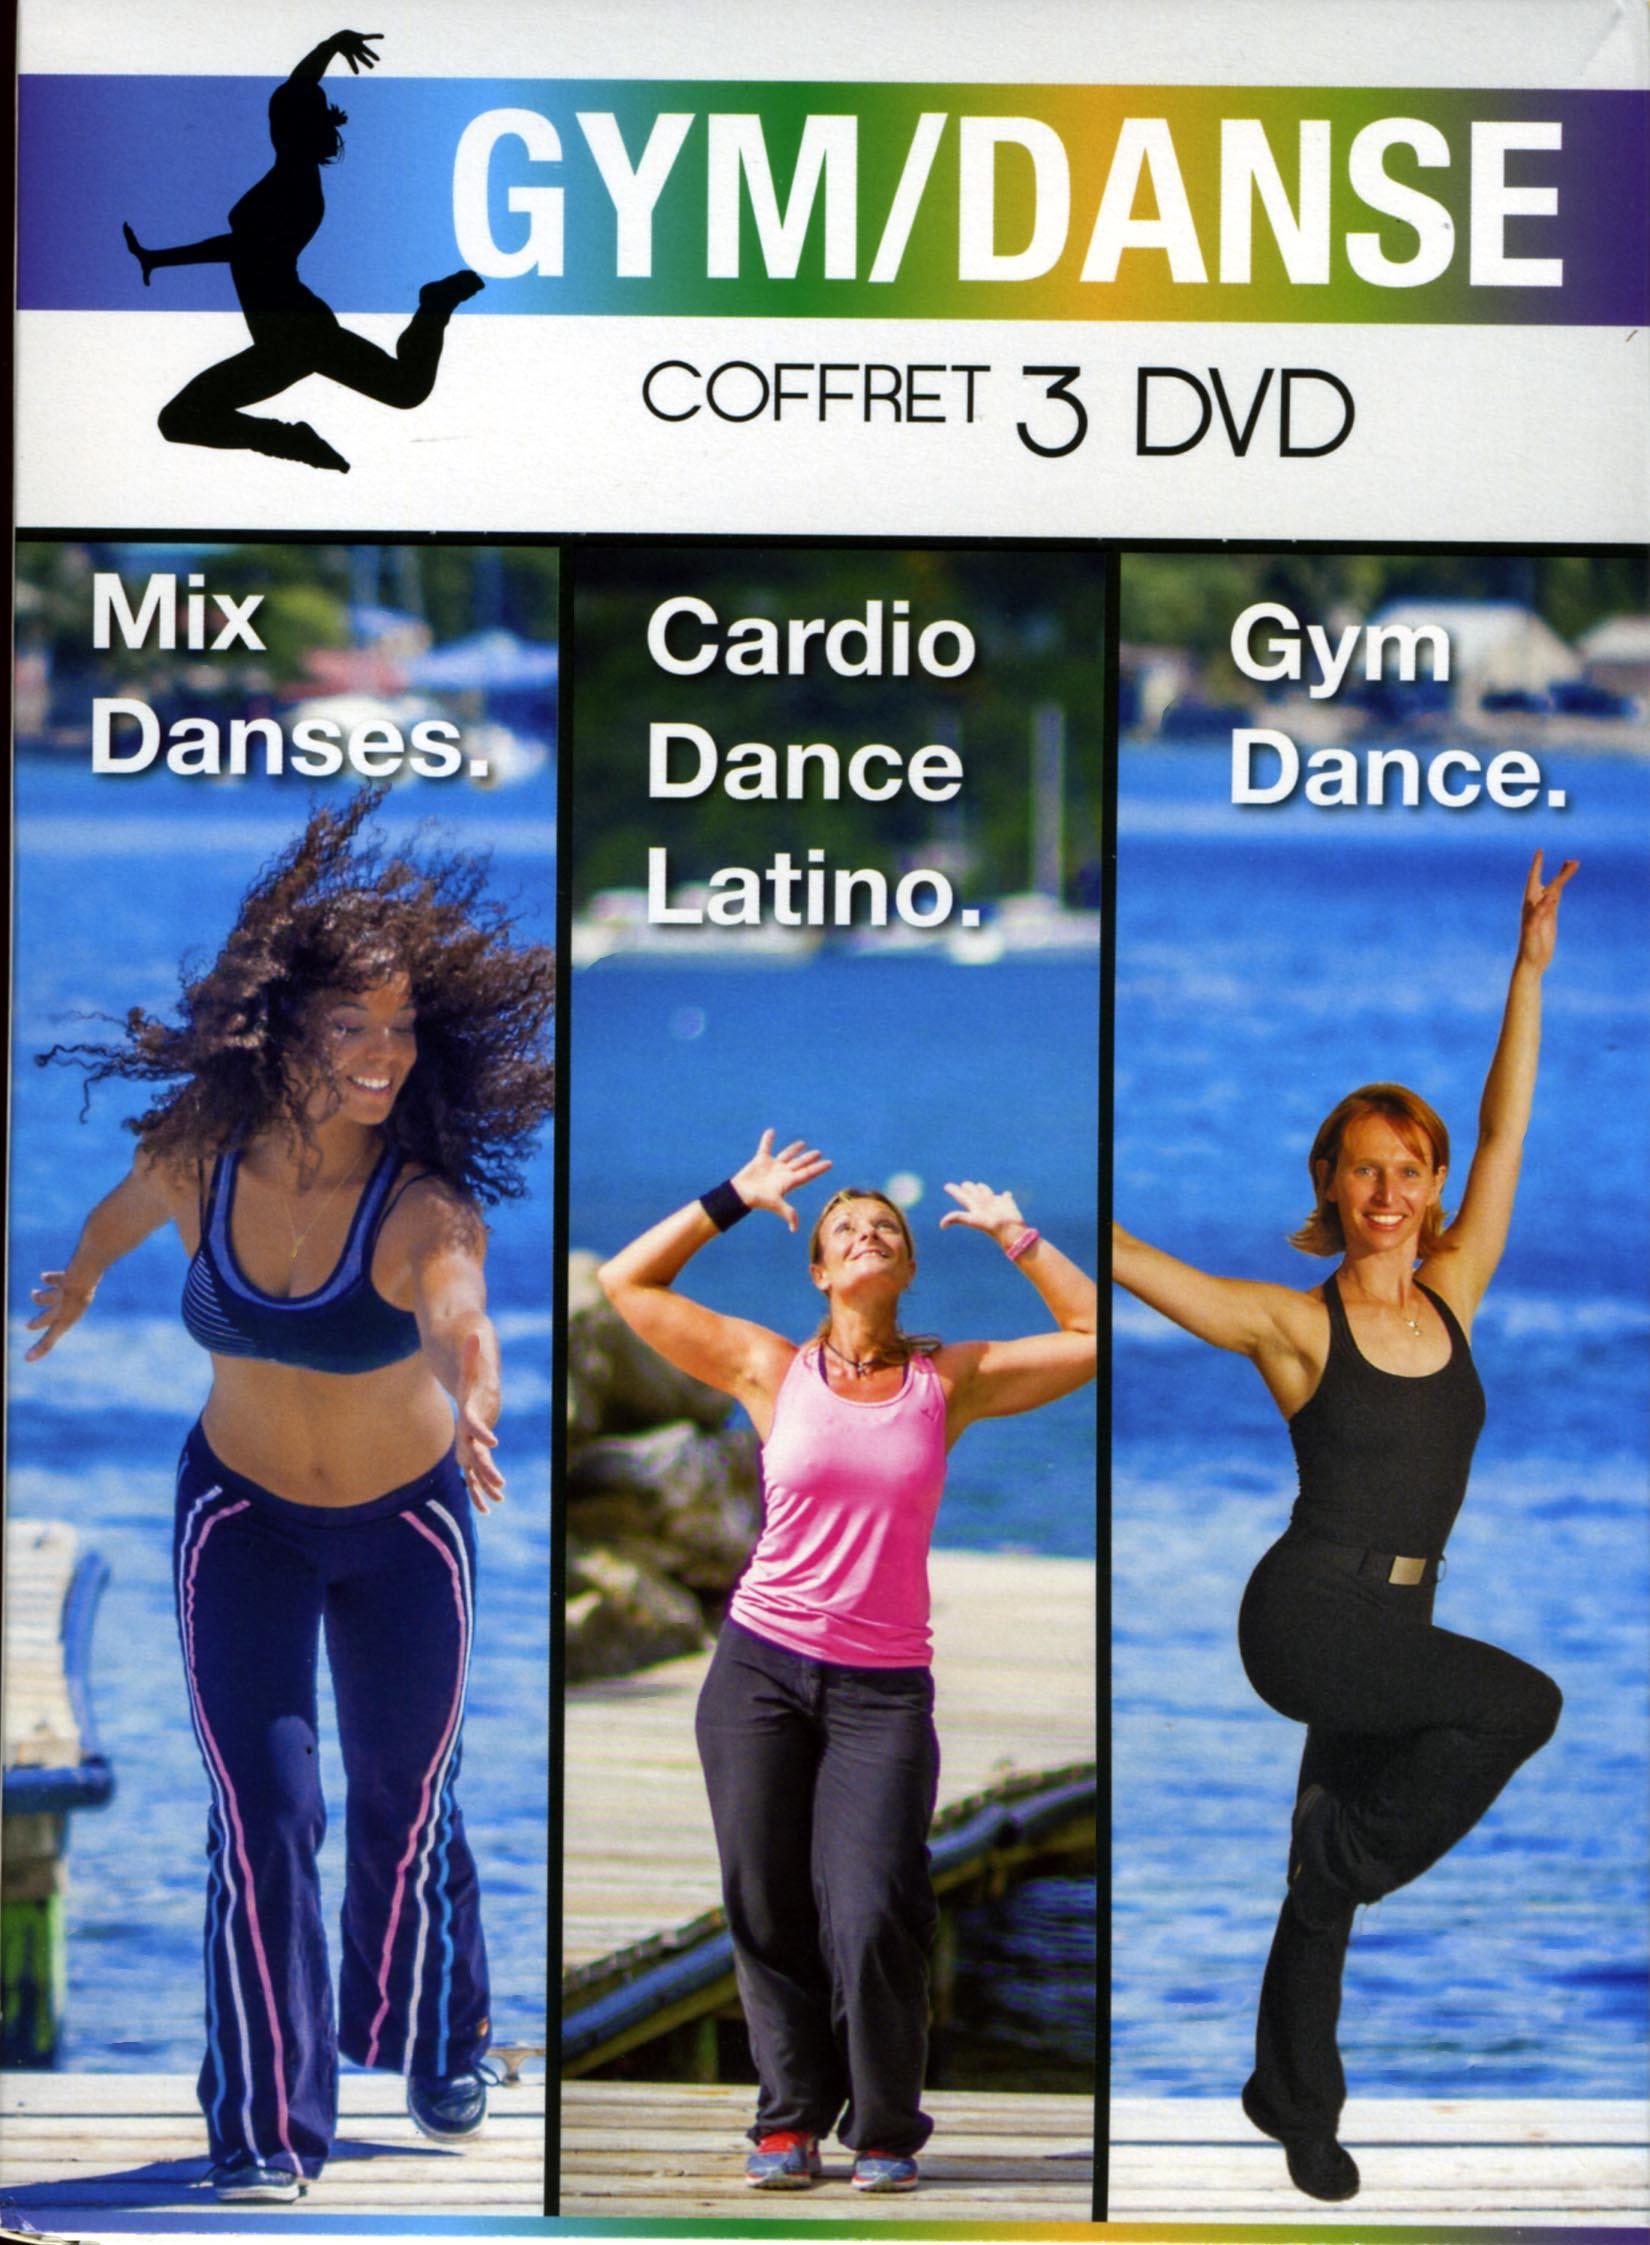 Gym dance - 3 dvd